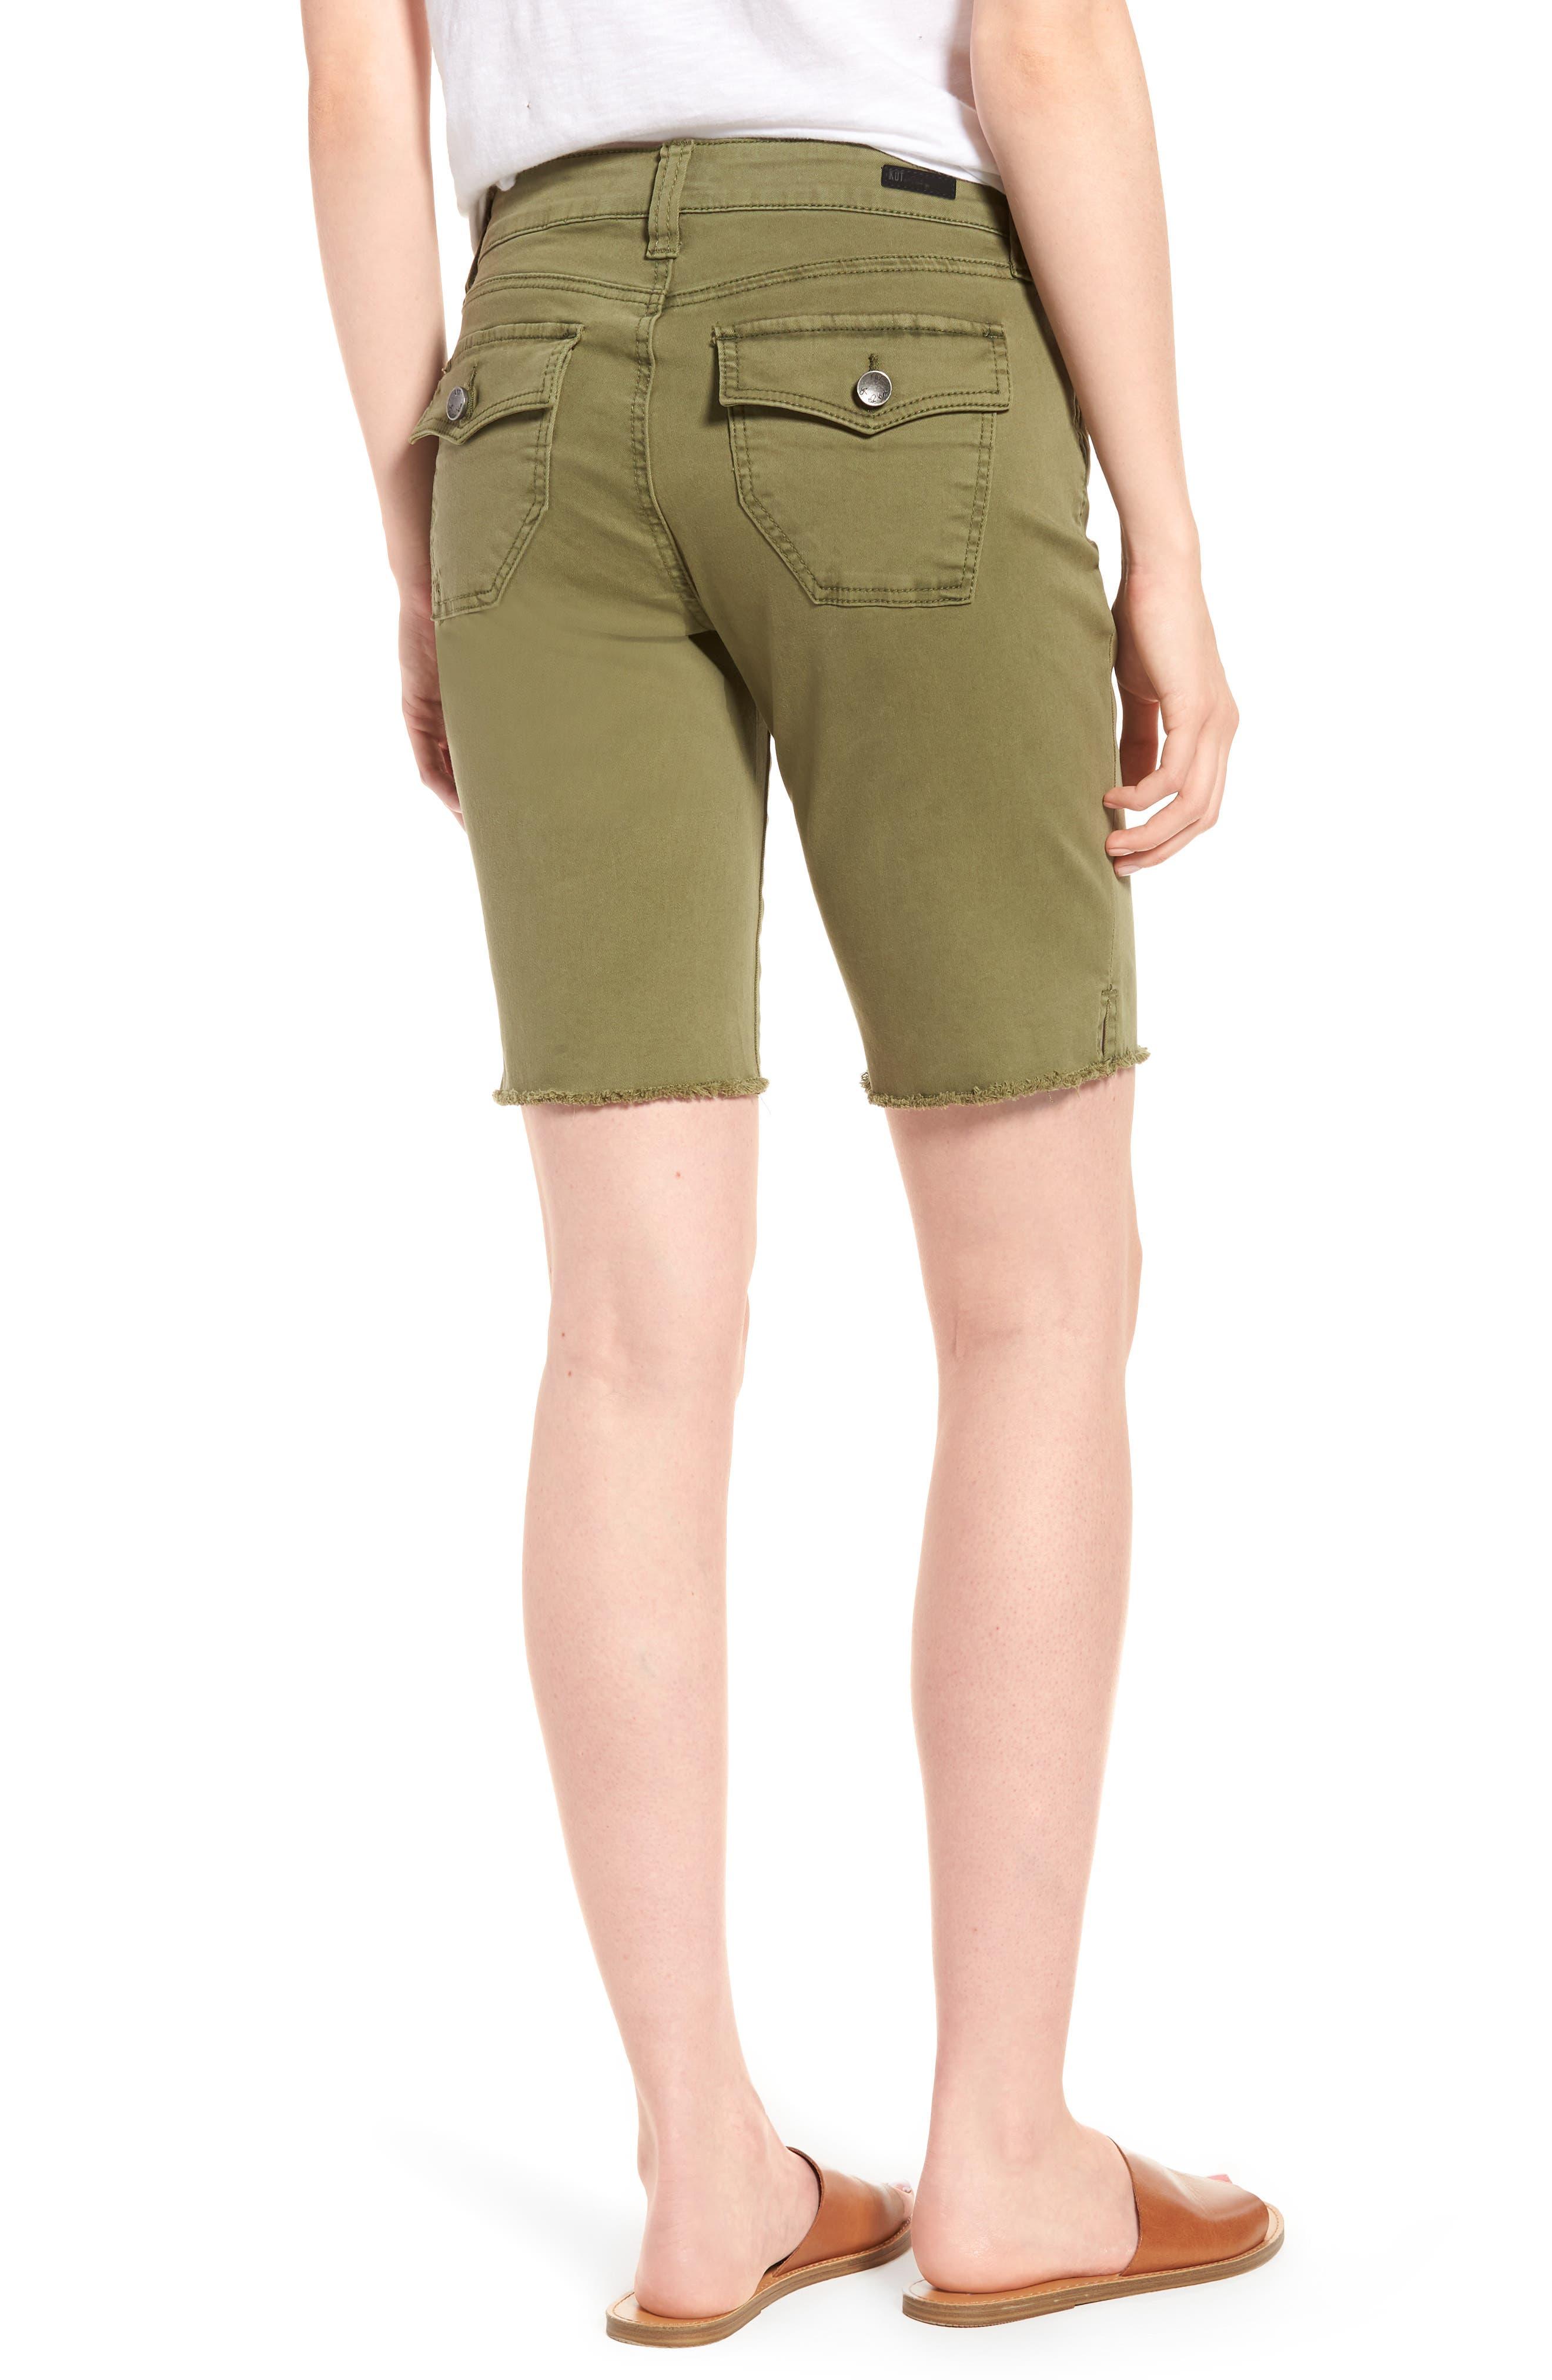 Natalie Bermuda Shorts,                             Alternate thumbnail 2, color,                             Olive